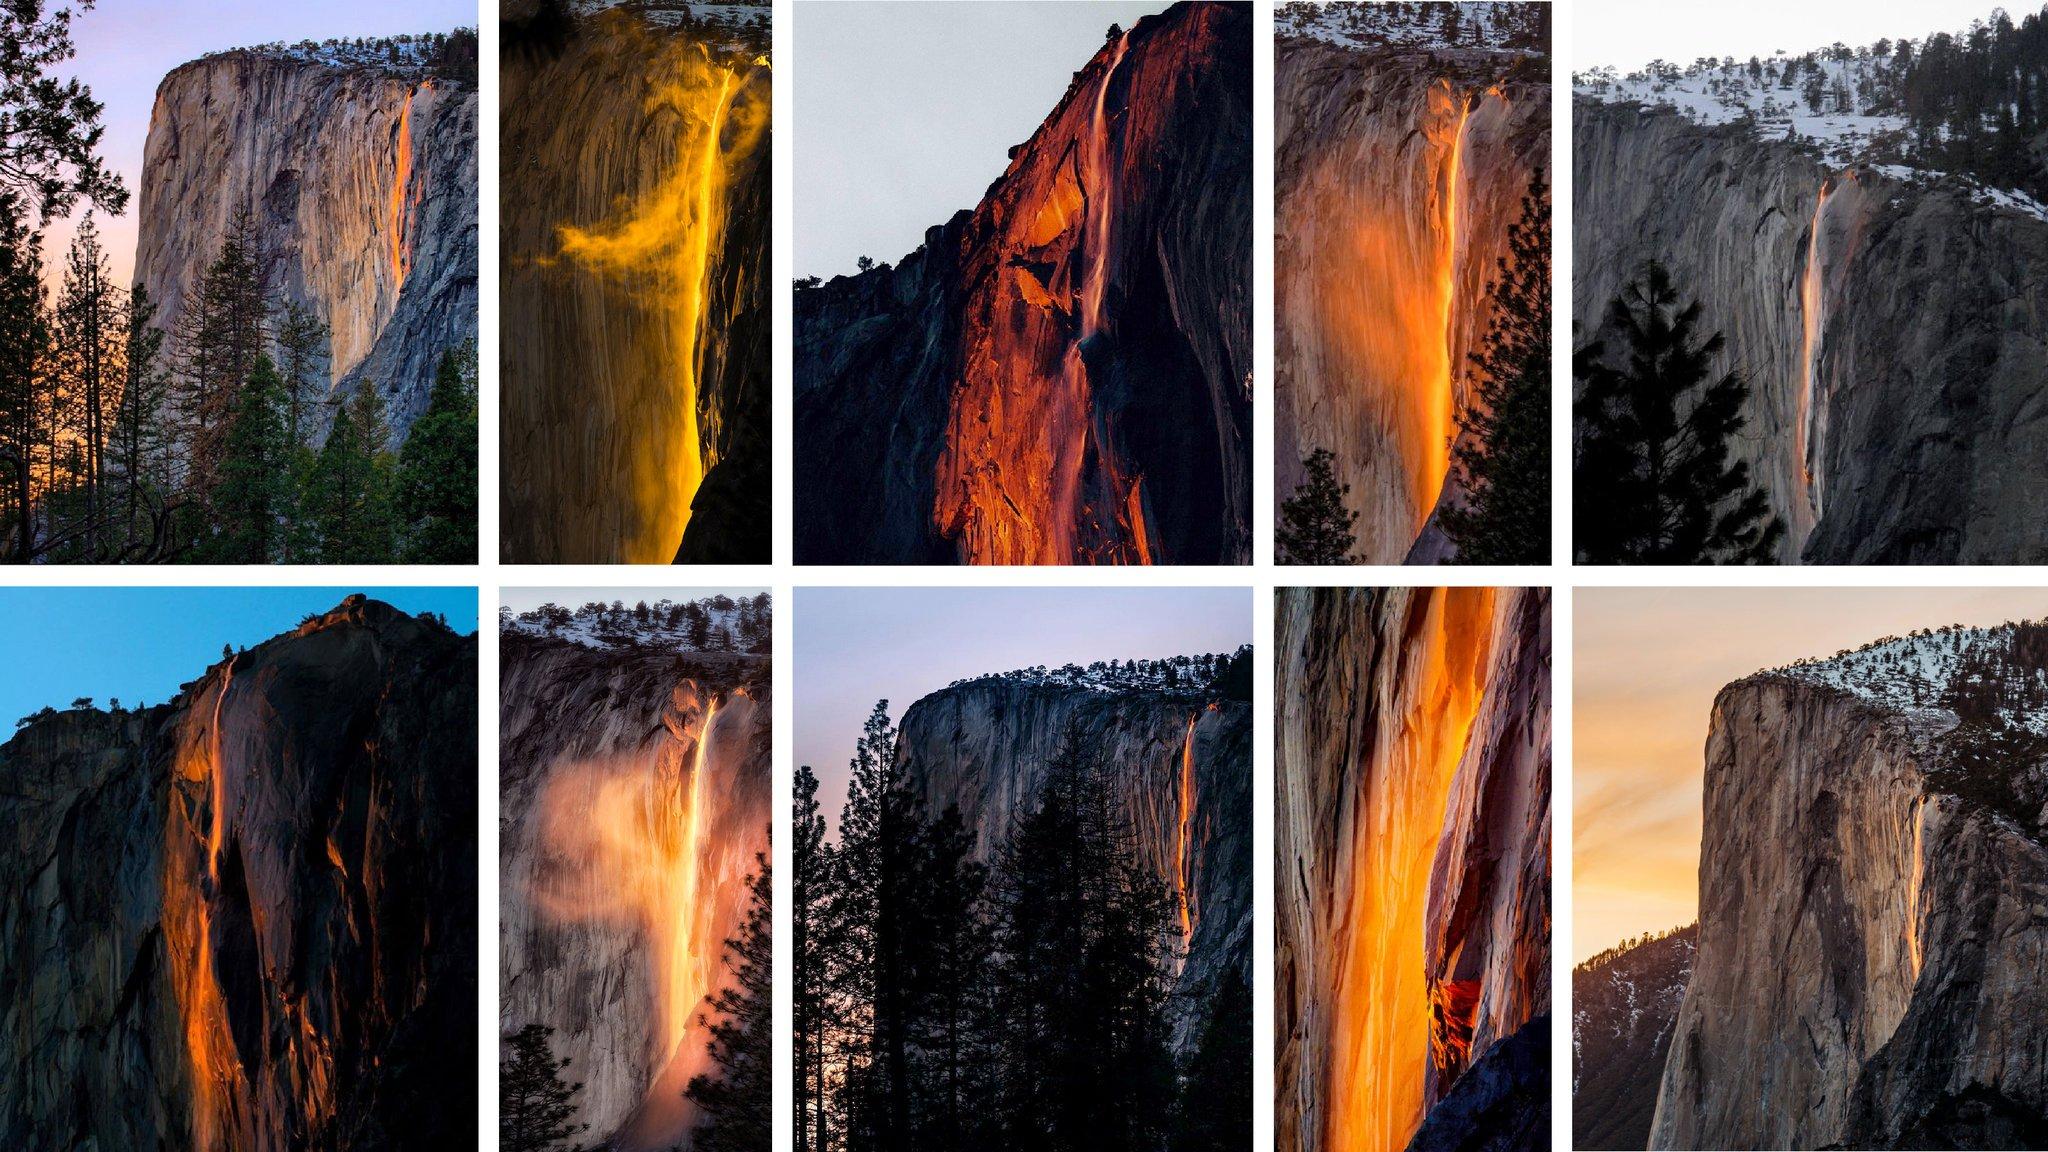 At Yosemite, a Waterfall Turns Into a Firefall